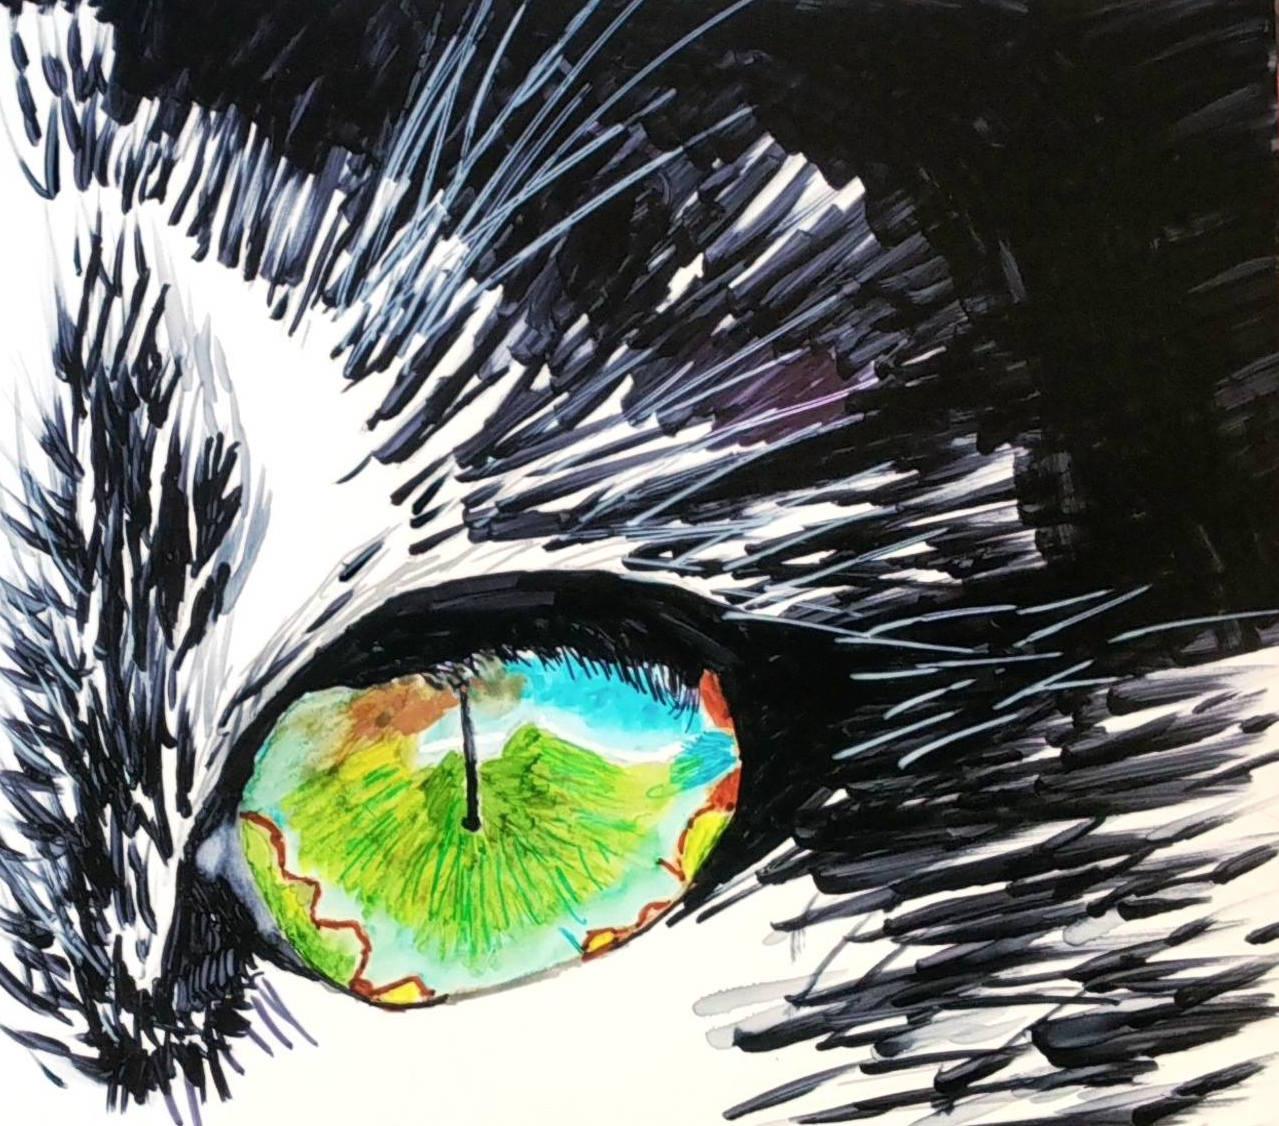 GinnyMcCartha-Smith Cat eye